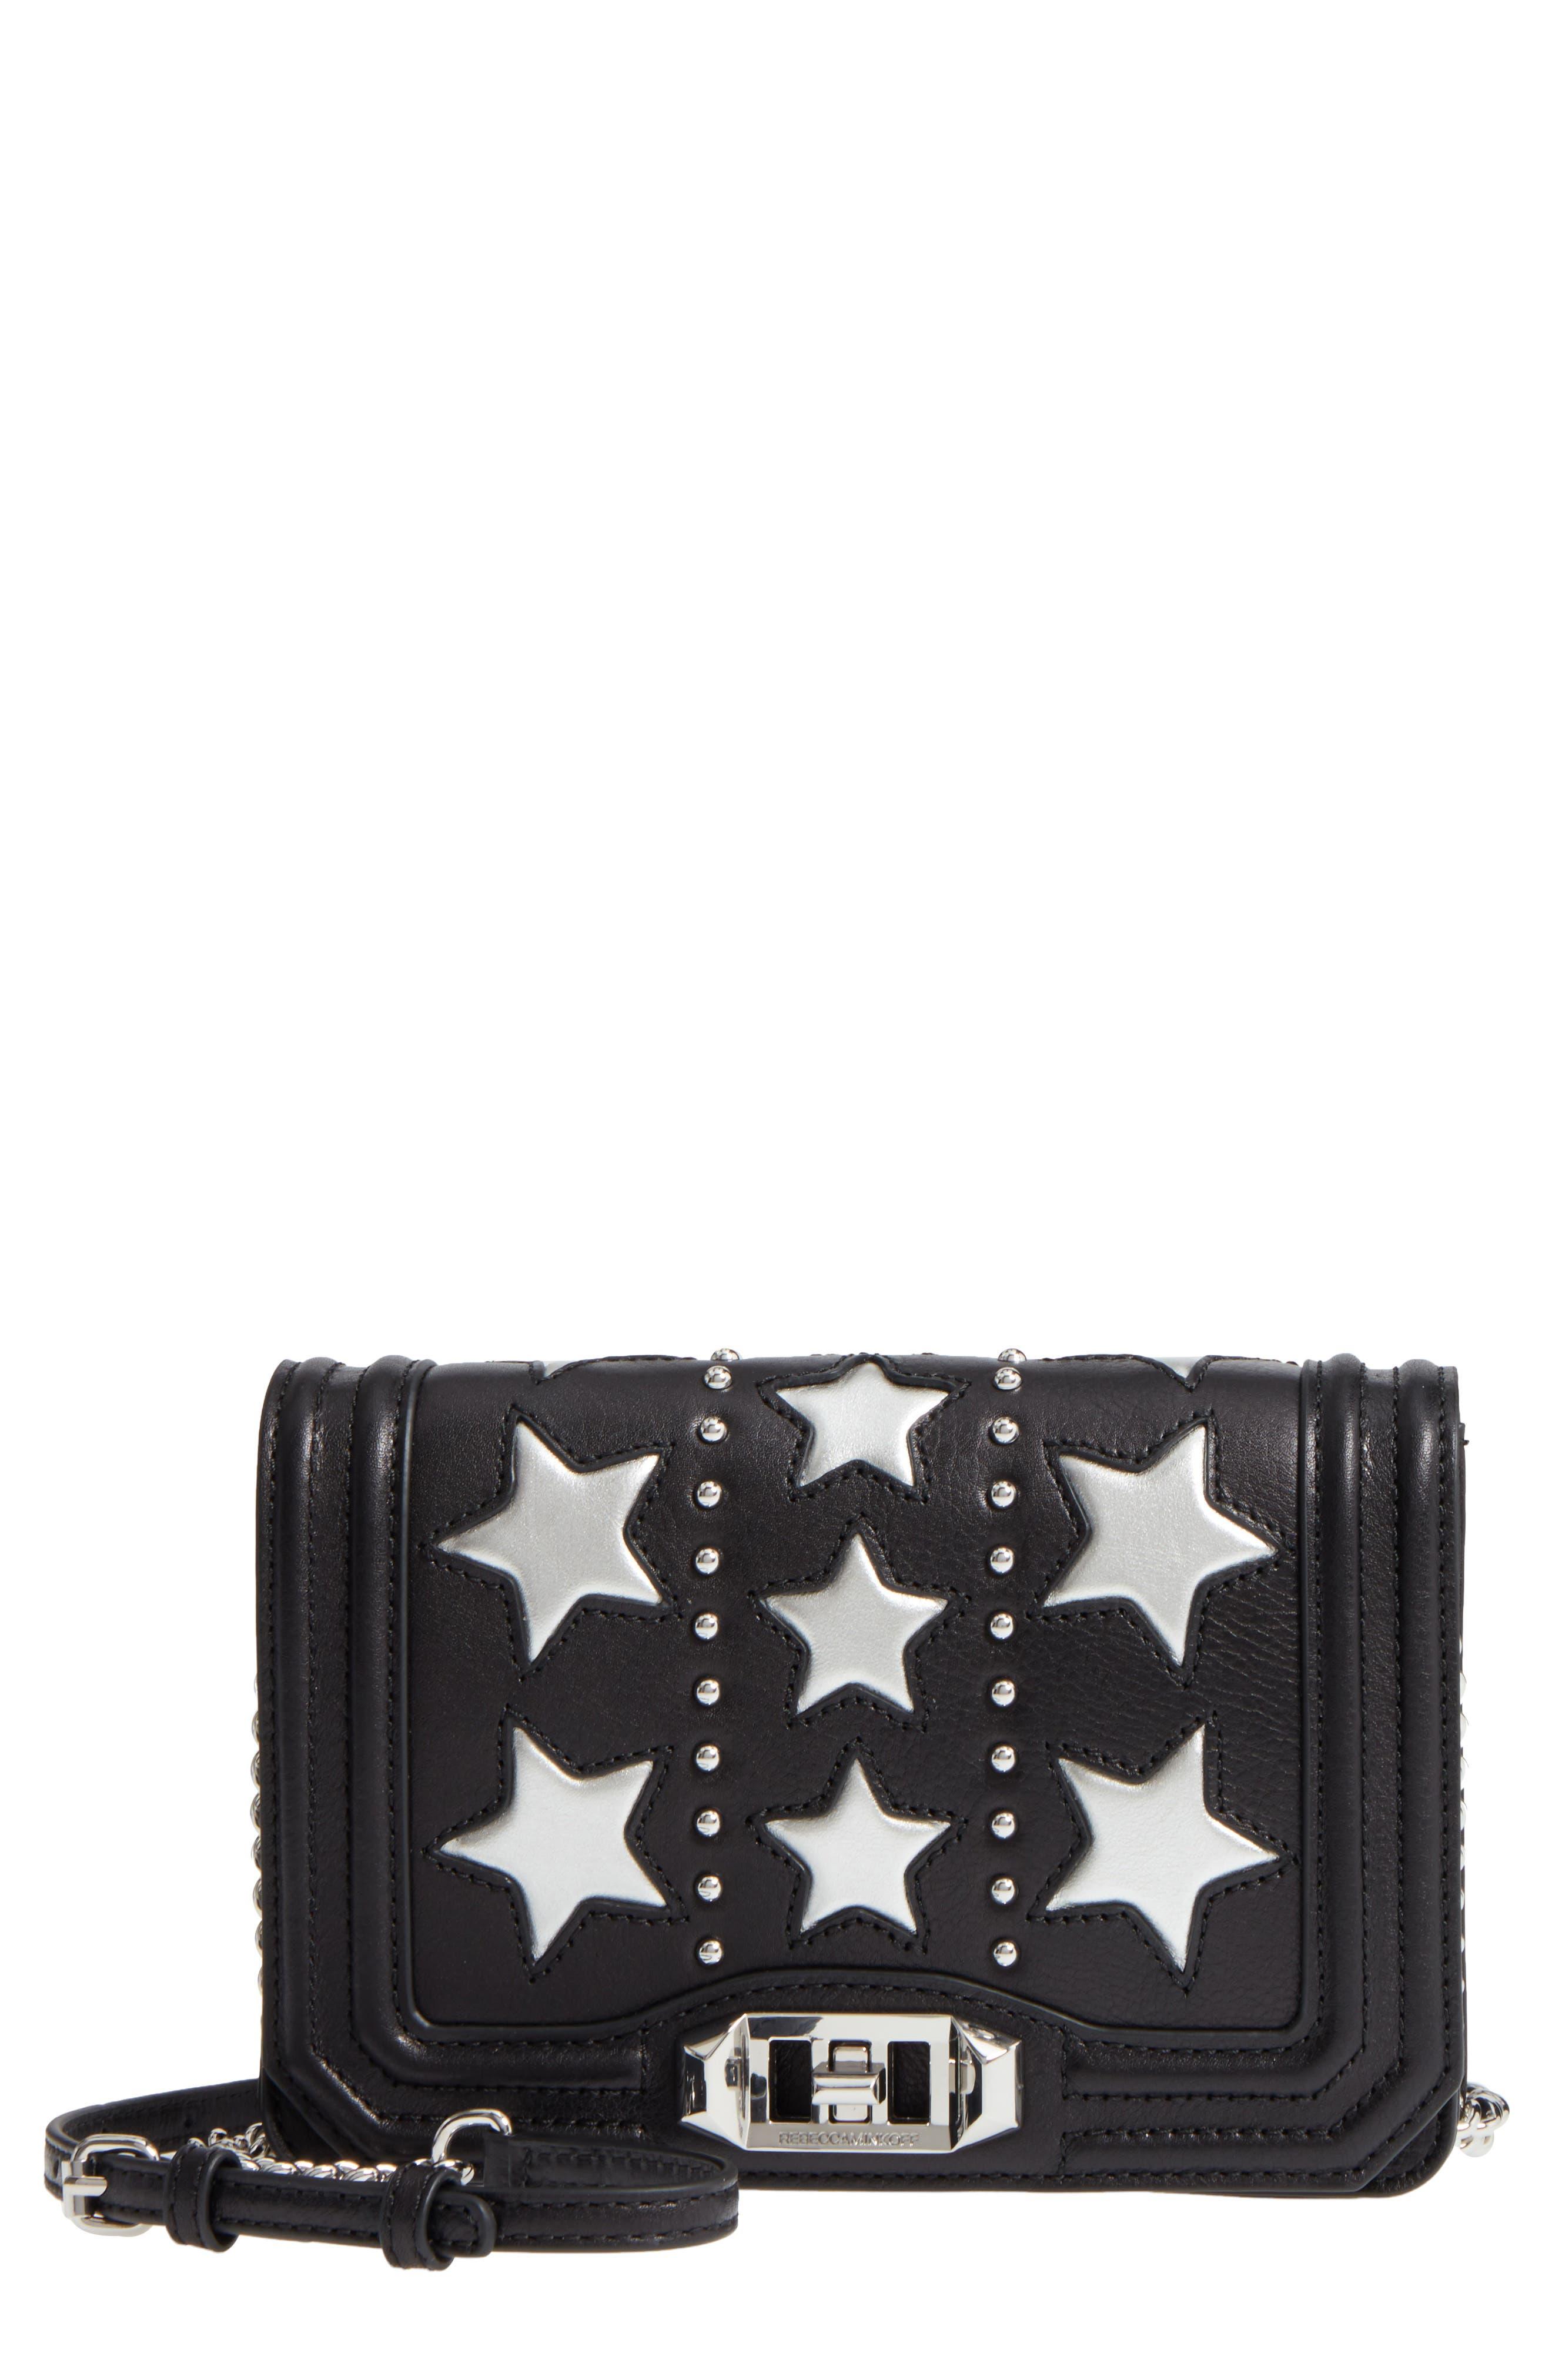 Rebecca Minkoff Small Star Love Crossbody Bag